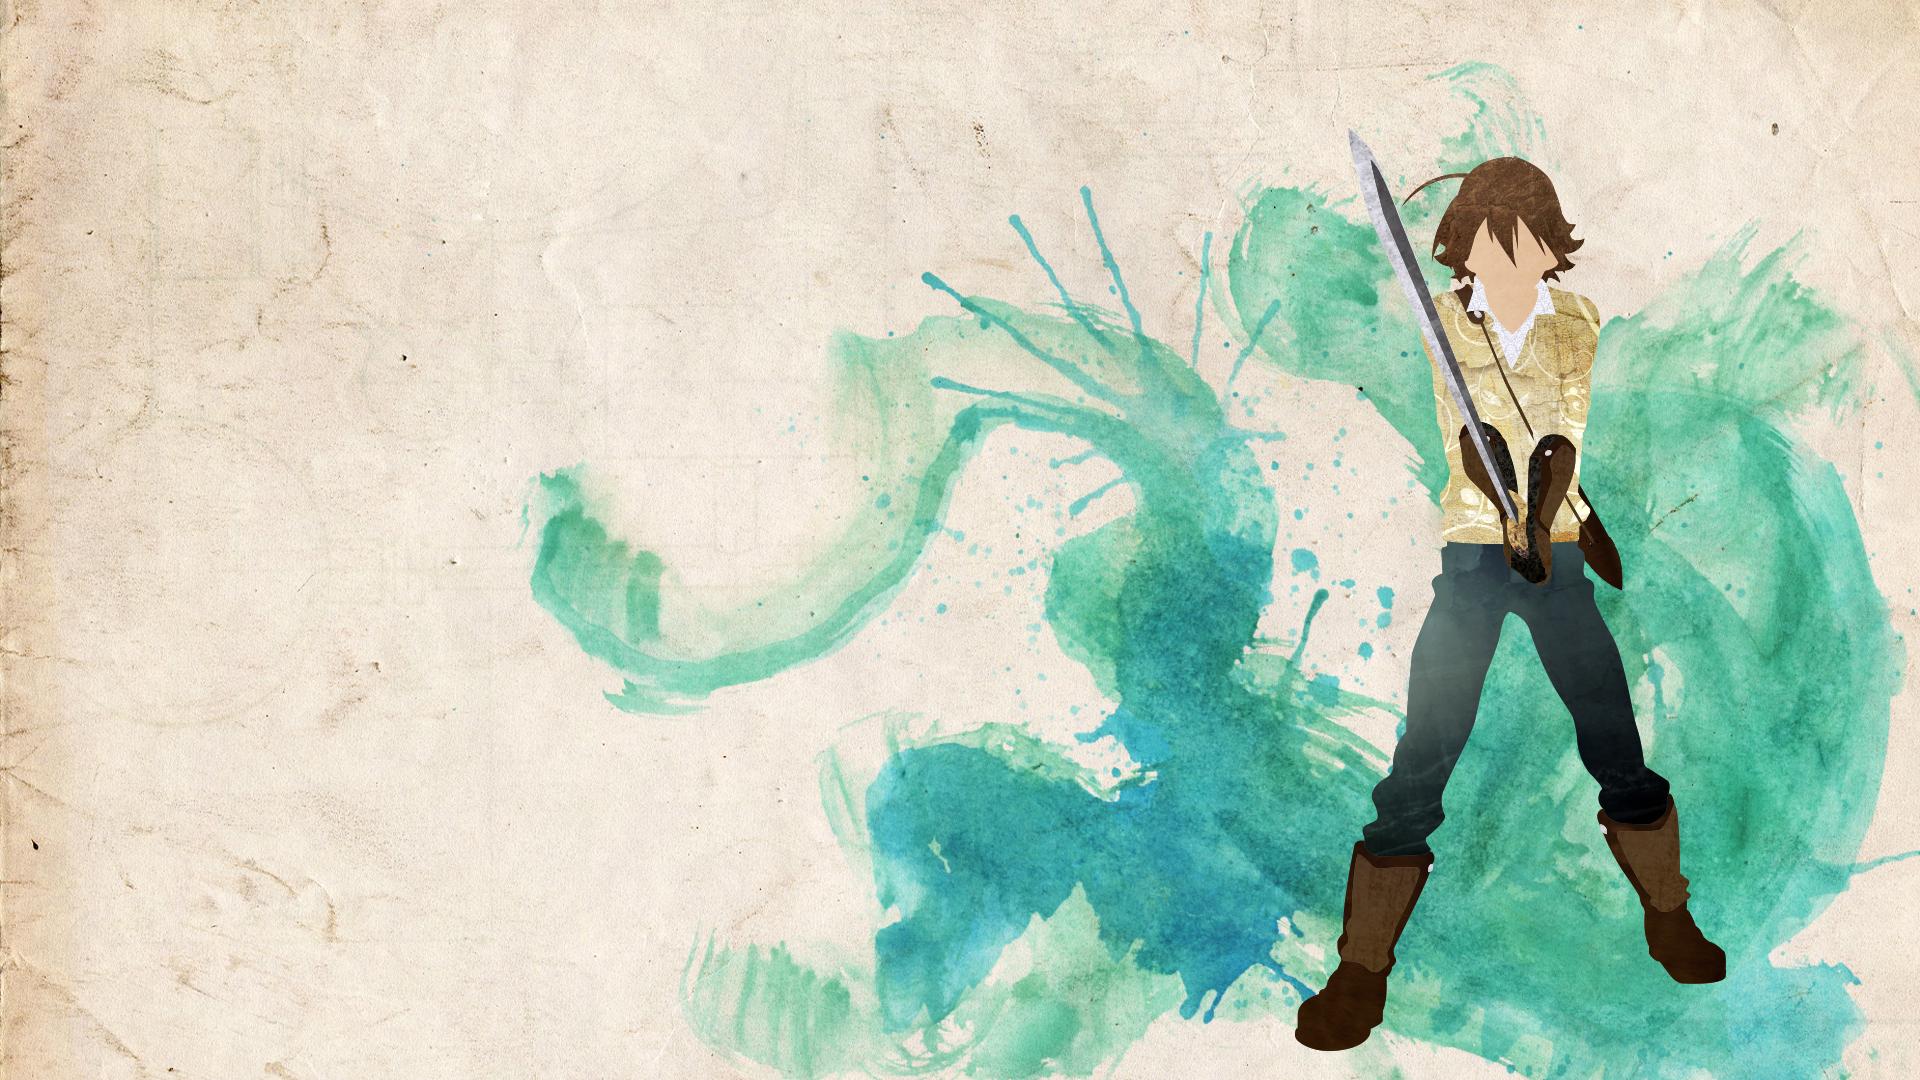 Wallpaper esdeath akame ga kill 4k anime 2604 -  16 Tatsumi Akame Ga Kill By Doubleu42 On Deviantart